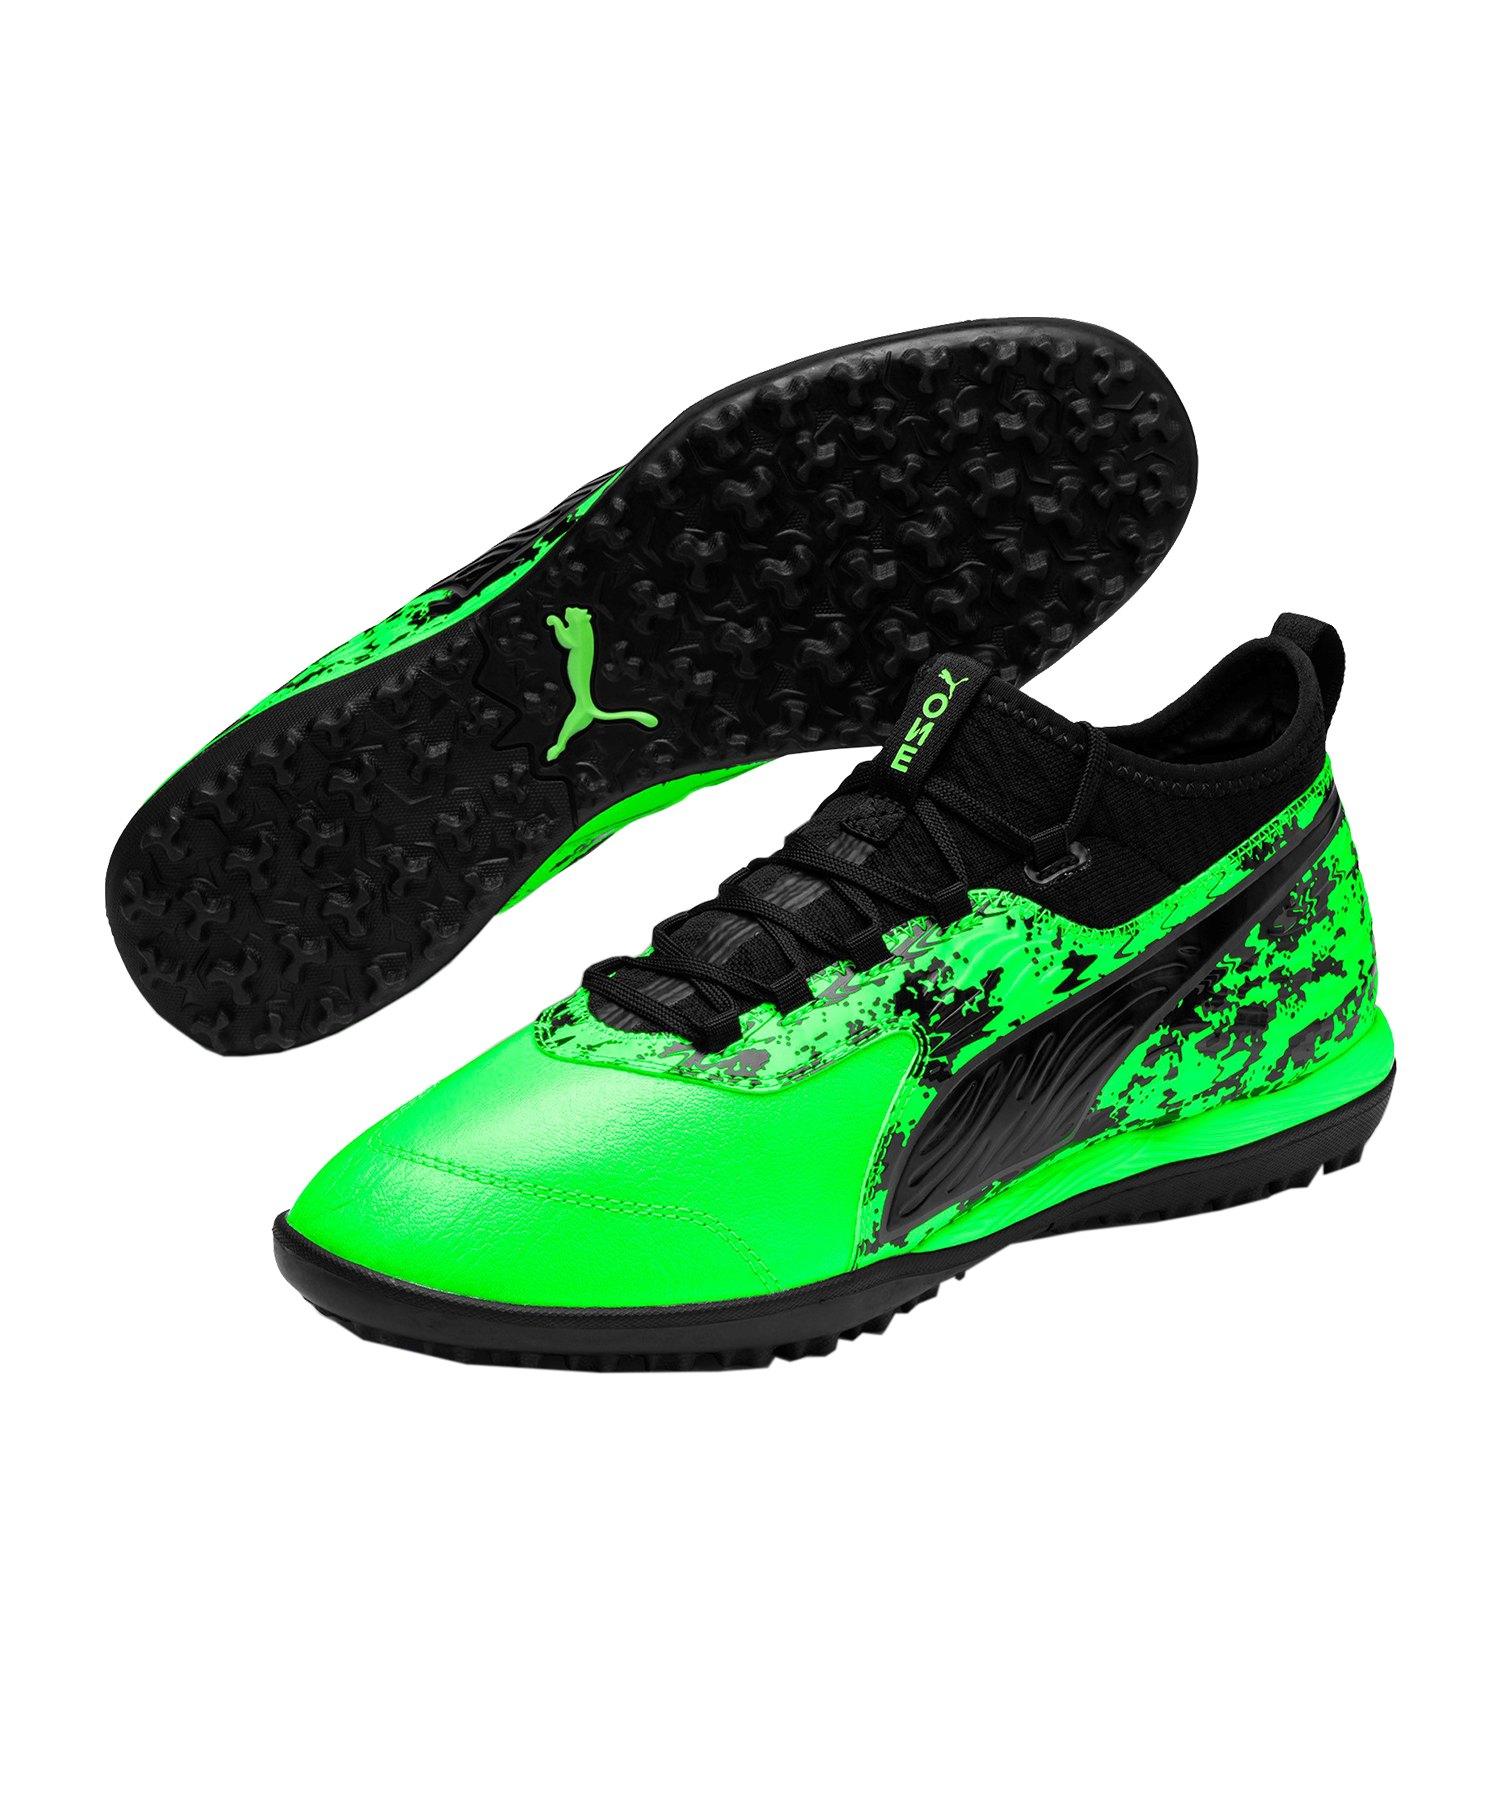 Schuhe Puma one 19.3 le tt turf f03 105489 003